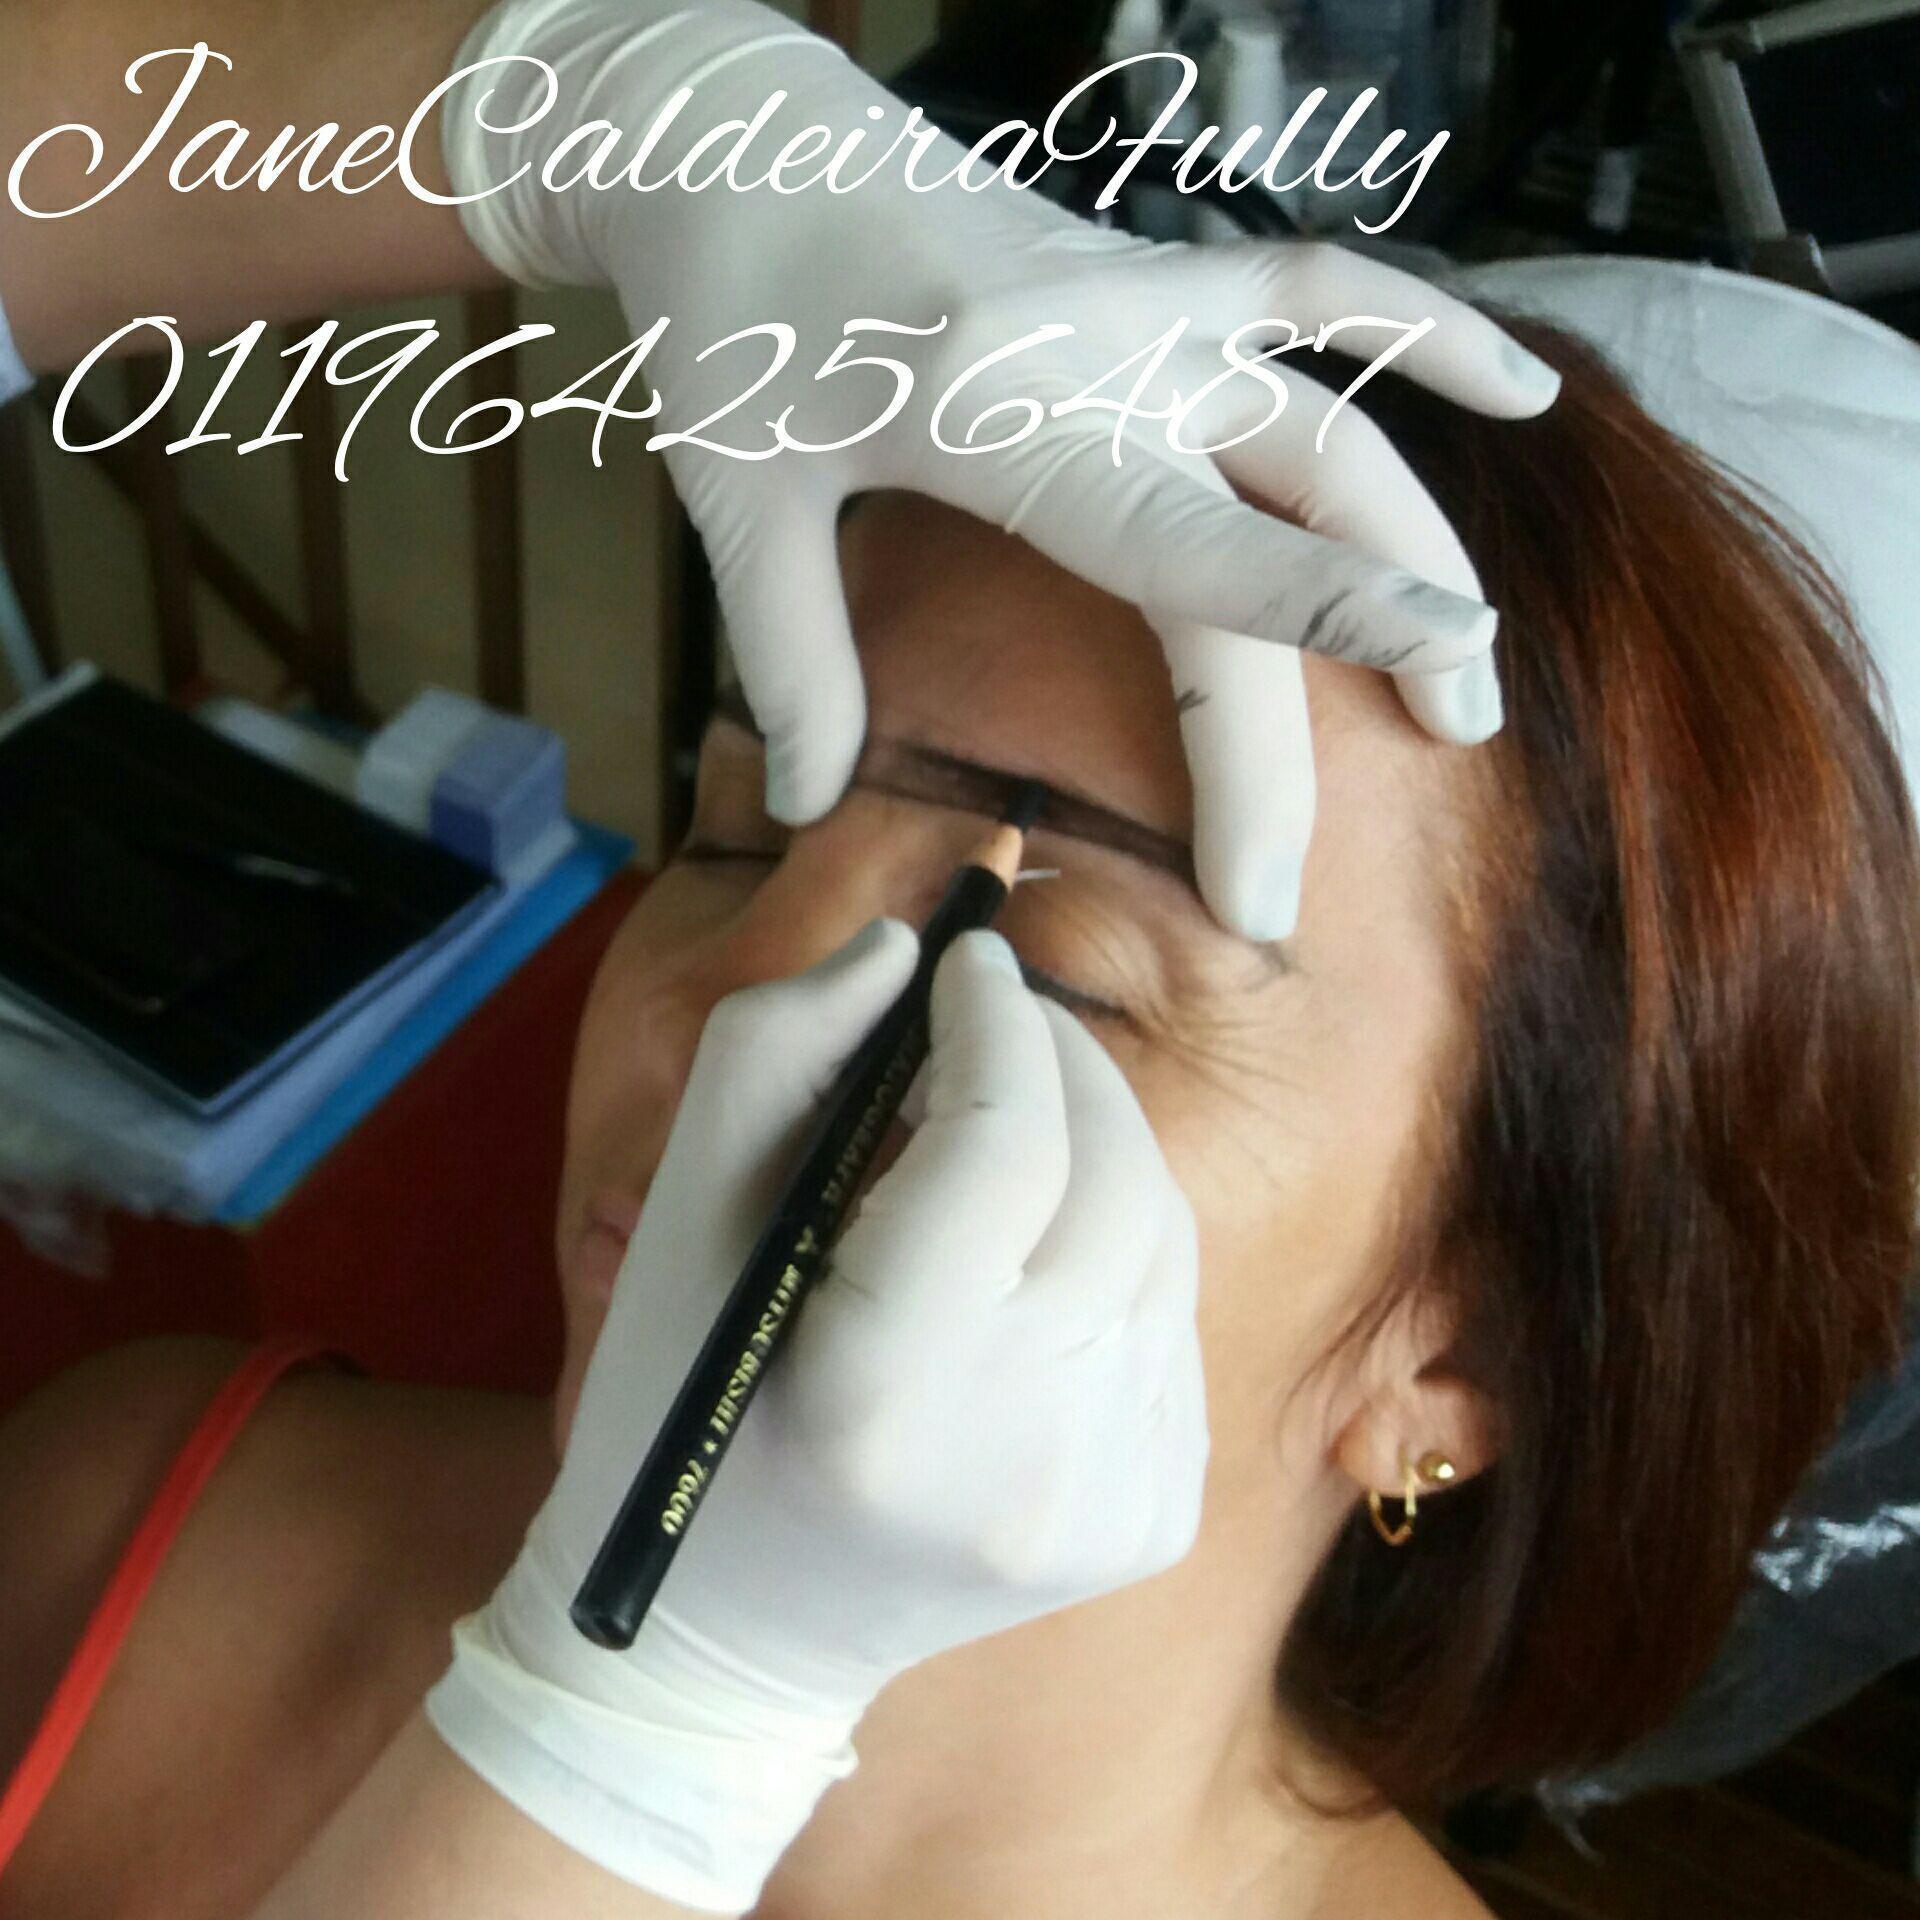 micropigmentador(a) depilador(a) designer de sobrancelhas esteticista outros micropigmentador(a) dermopigmentador(a) maquiador(a)